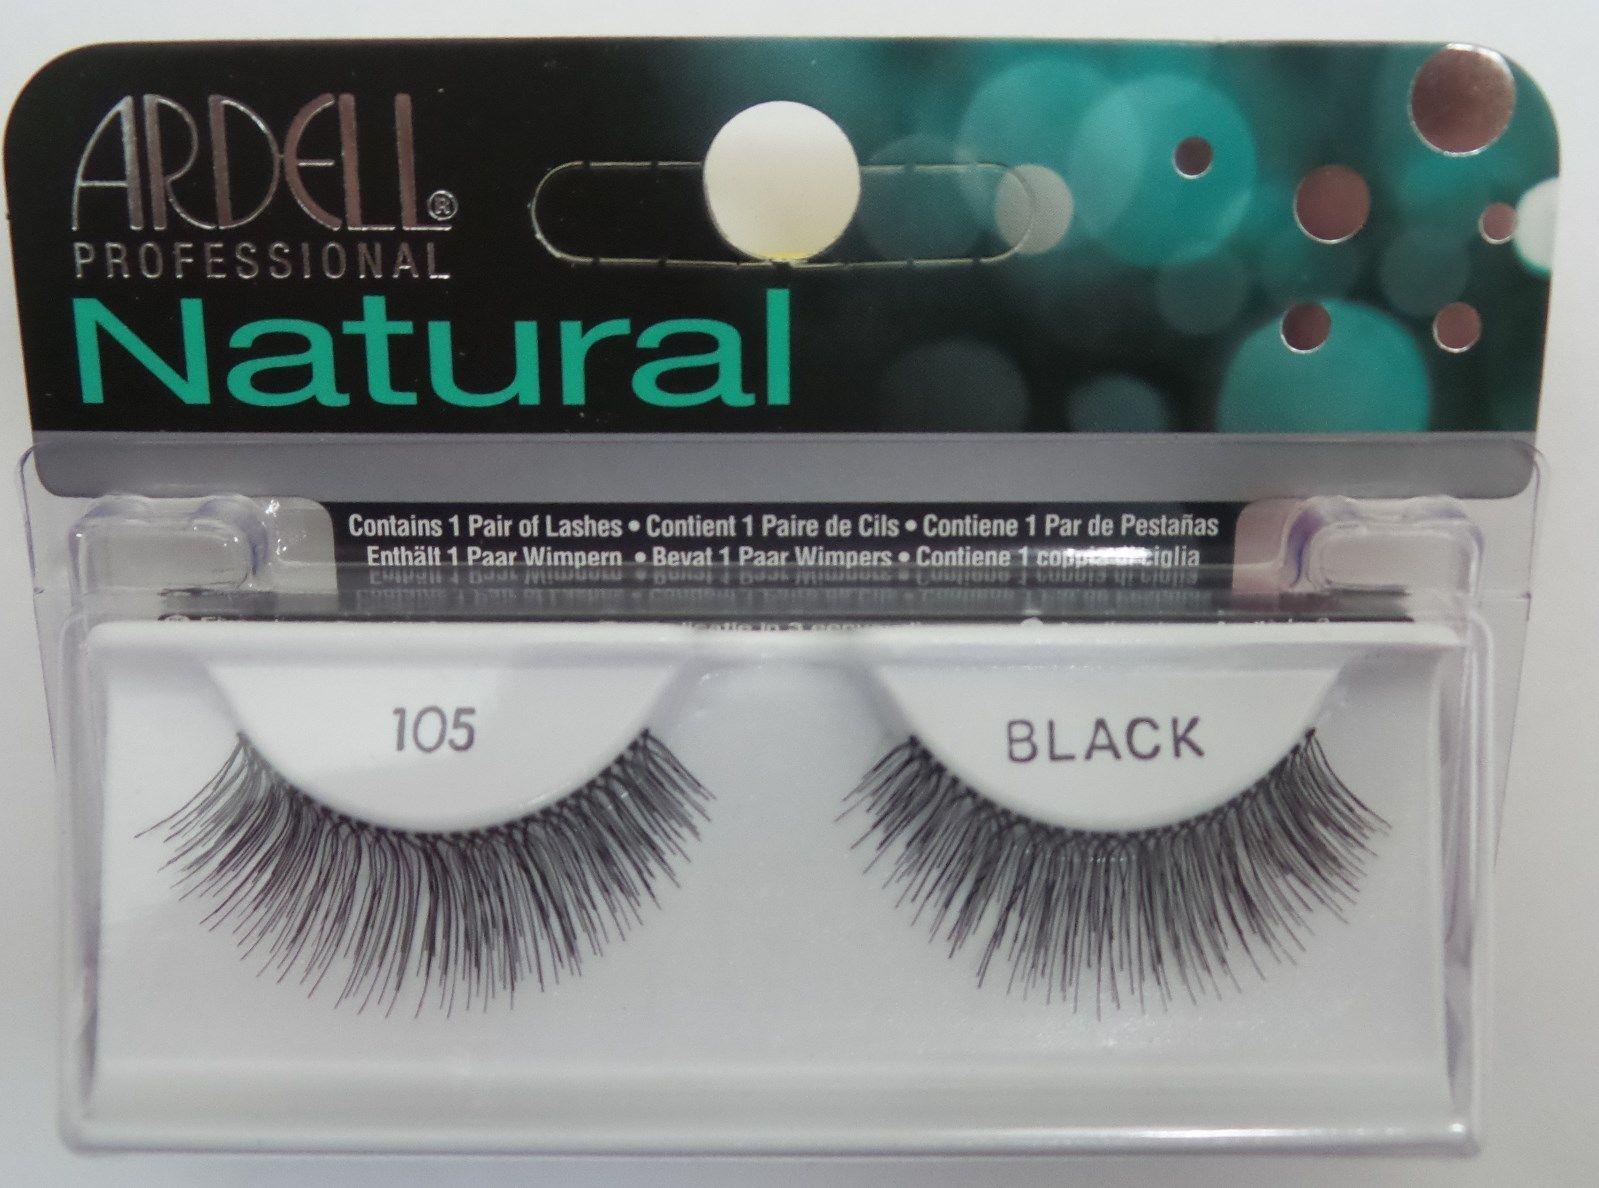 bcf17d71fd7 (Lot Of 10) Ardell Natural Lashes #105 False Fake Eyelashes Black Lash  Eyelash